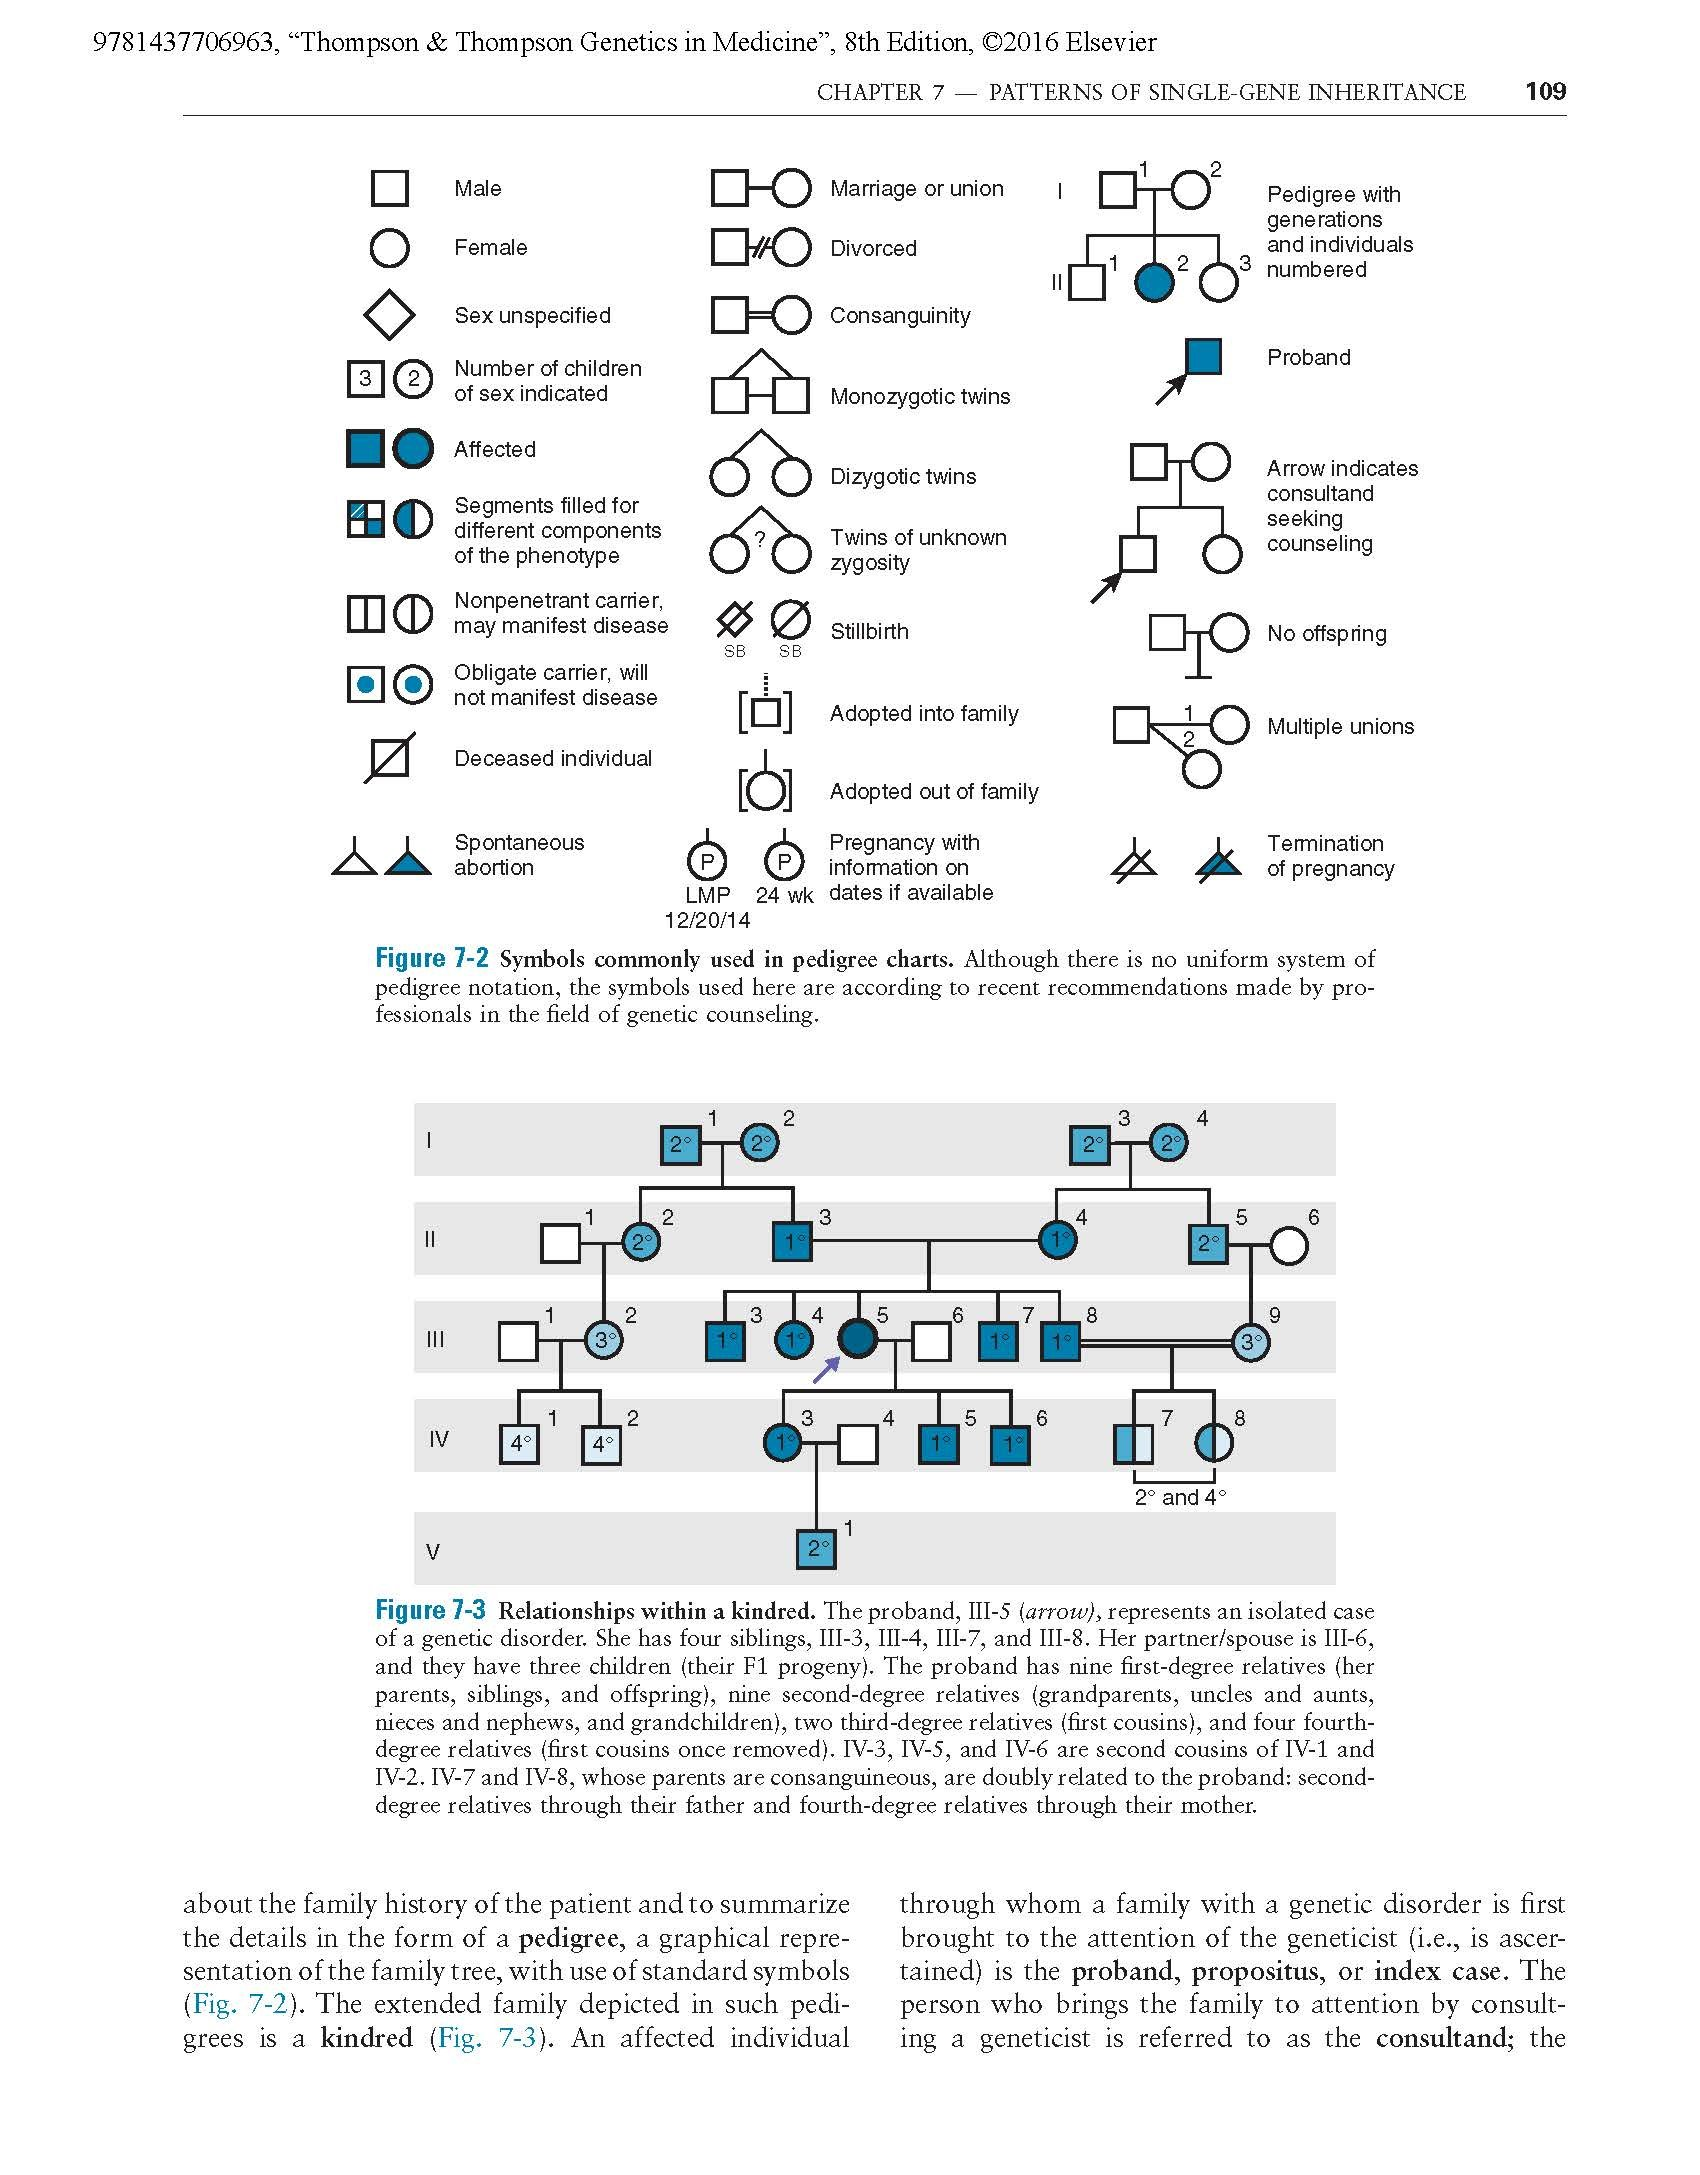 GENETICS IN MEDICINE THOMPSON PDF